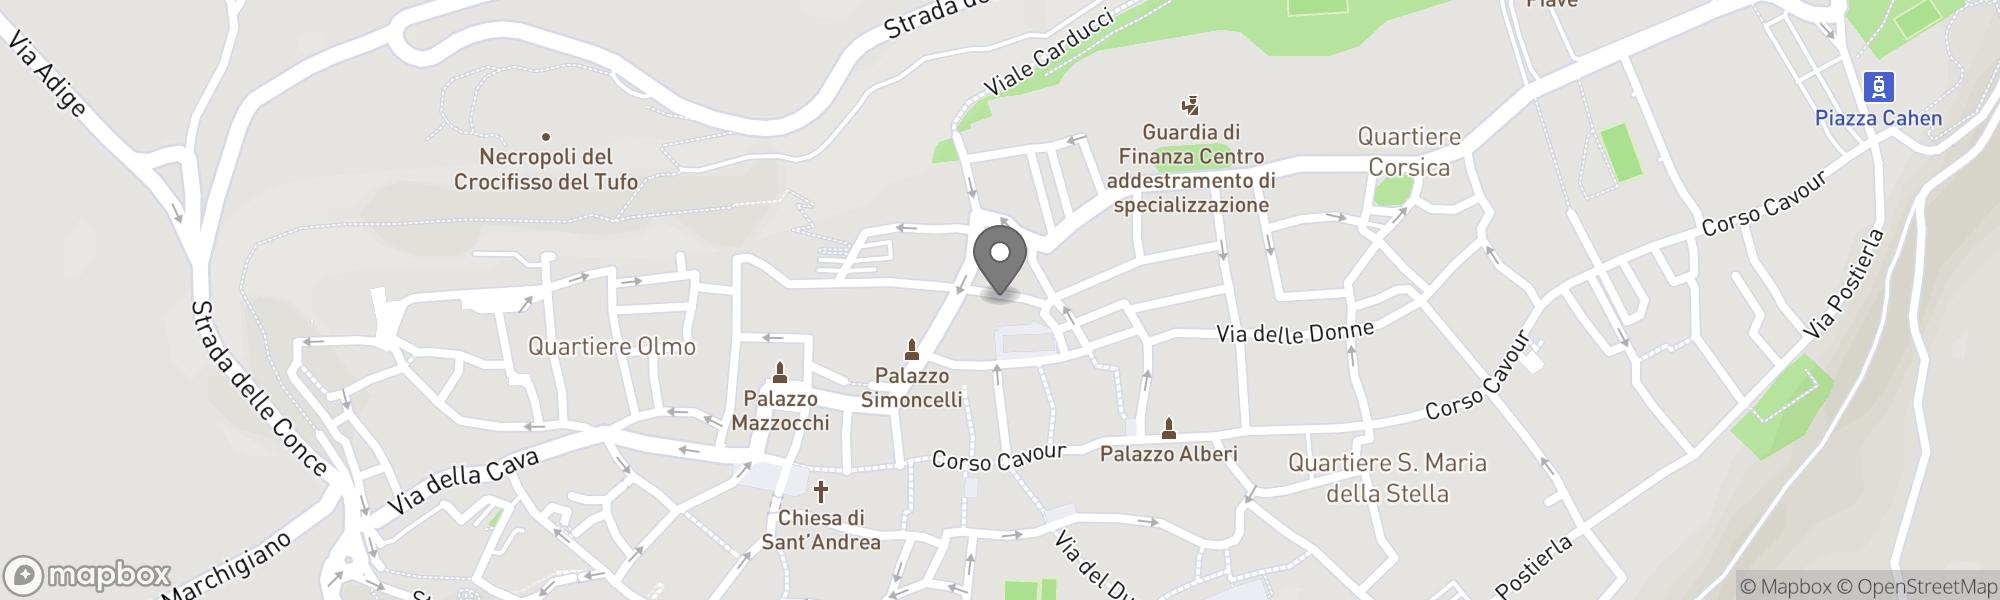 Map of Orvieto area